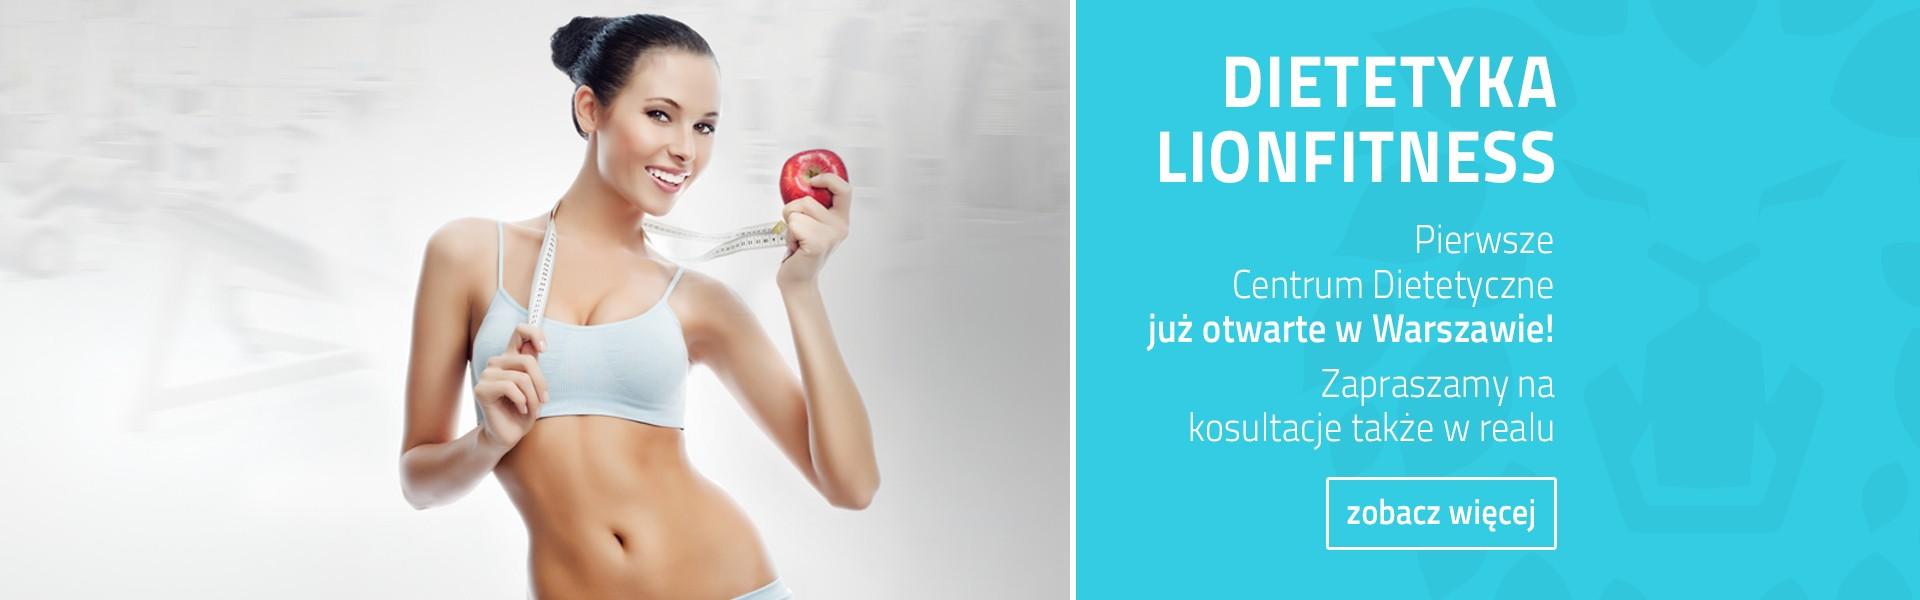 Centrum Dietetyczne Lionfitness